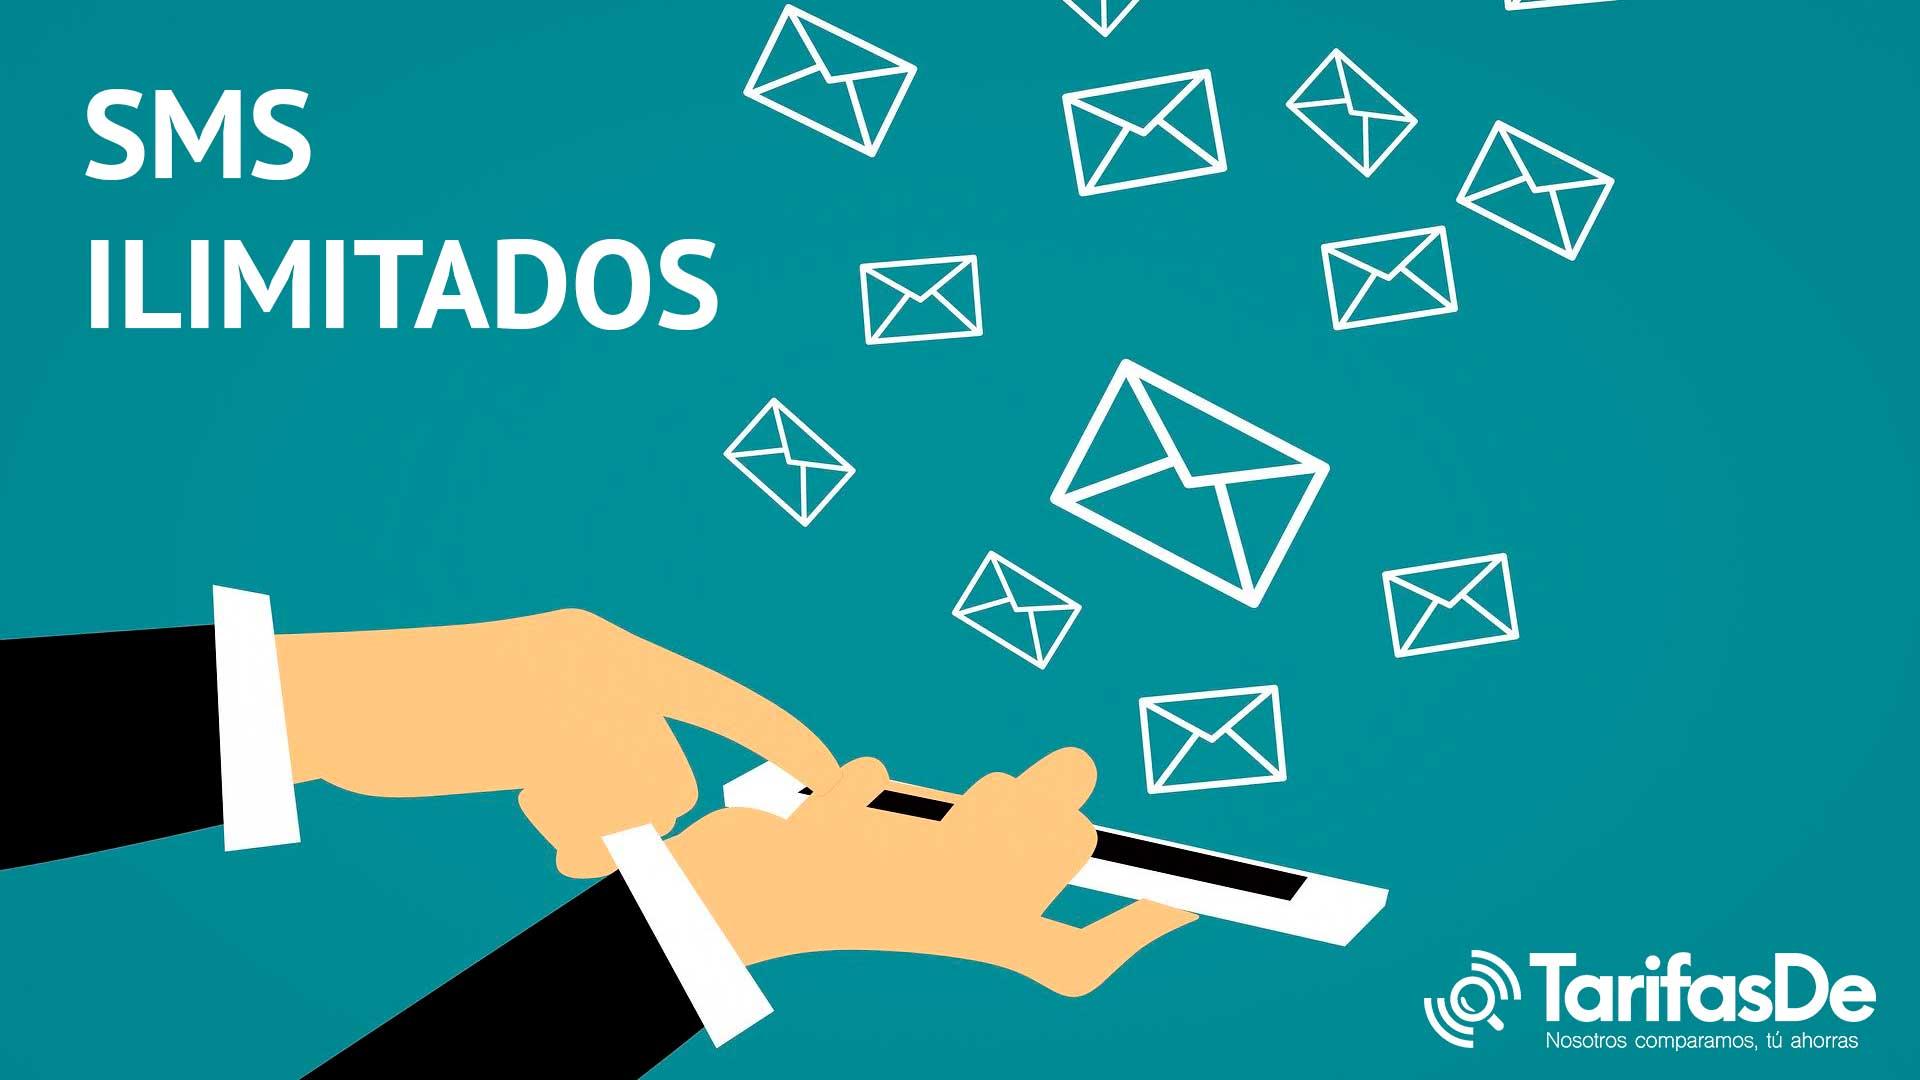 Tarifas SMS ilimitados